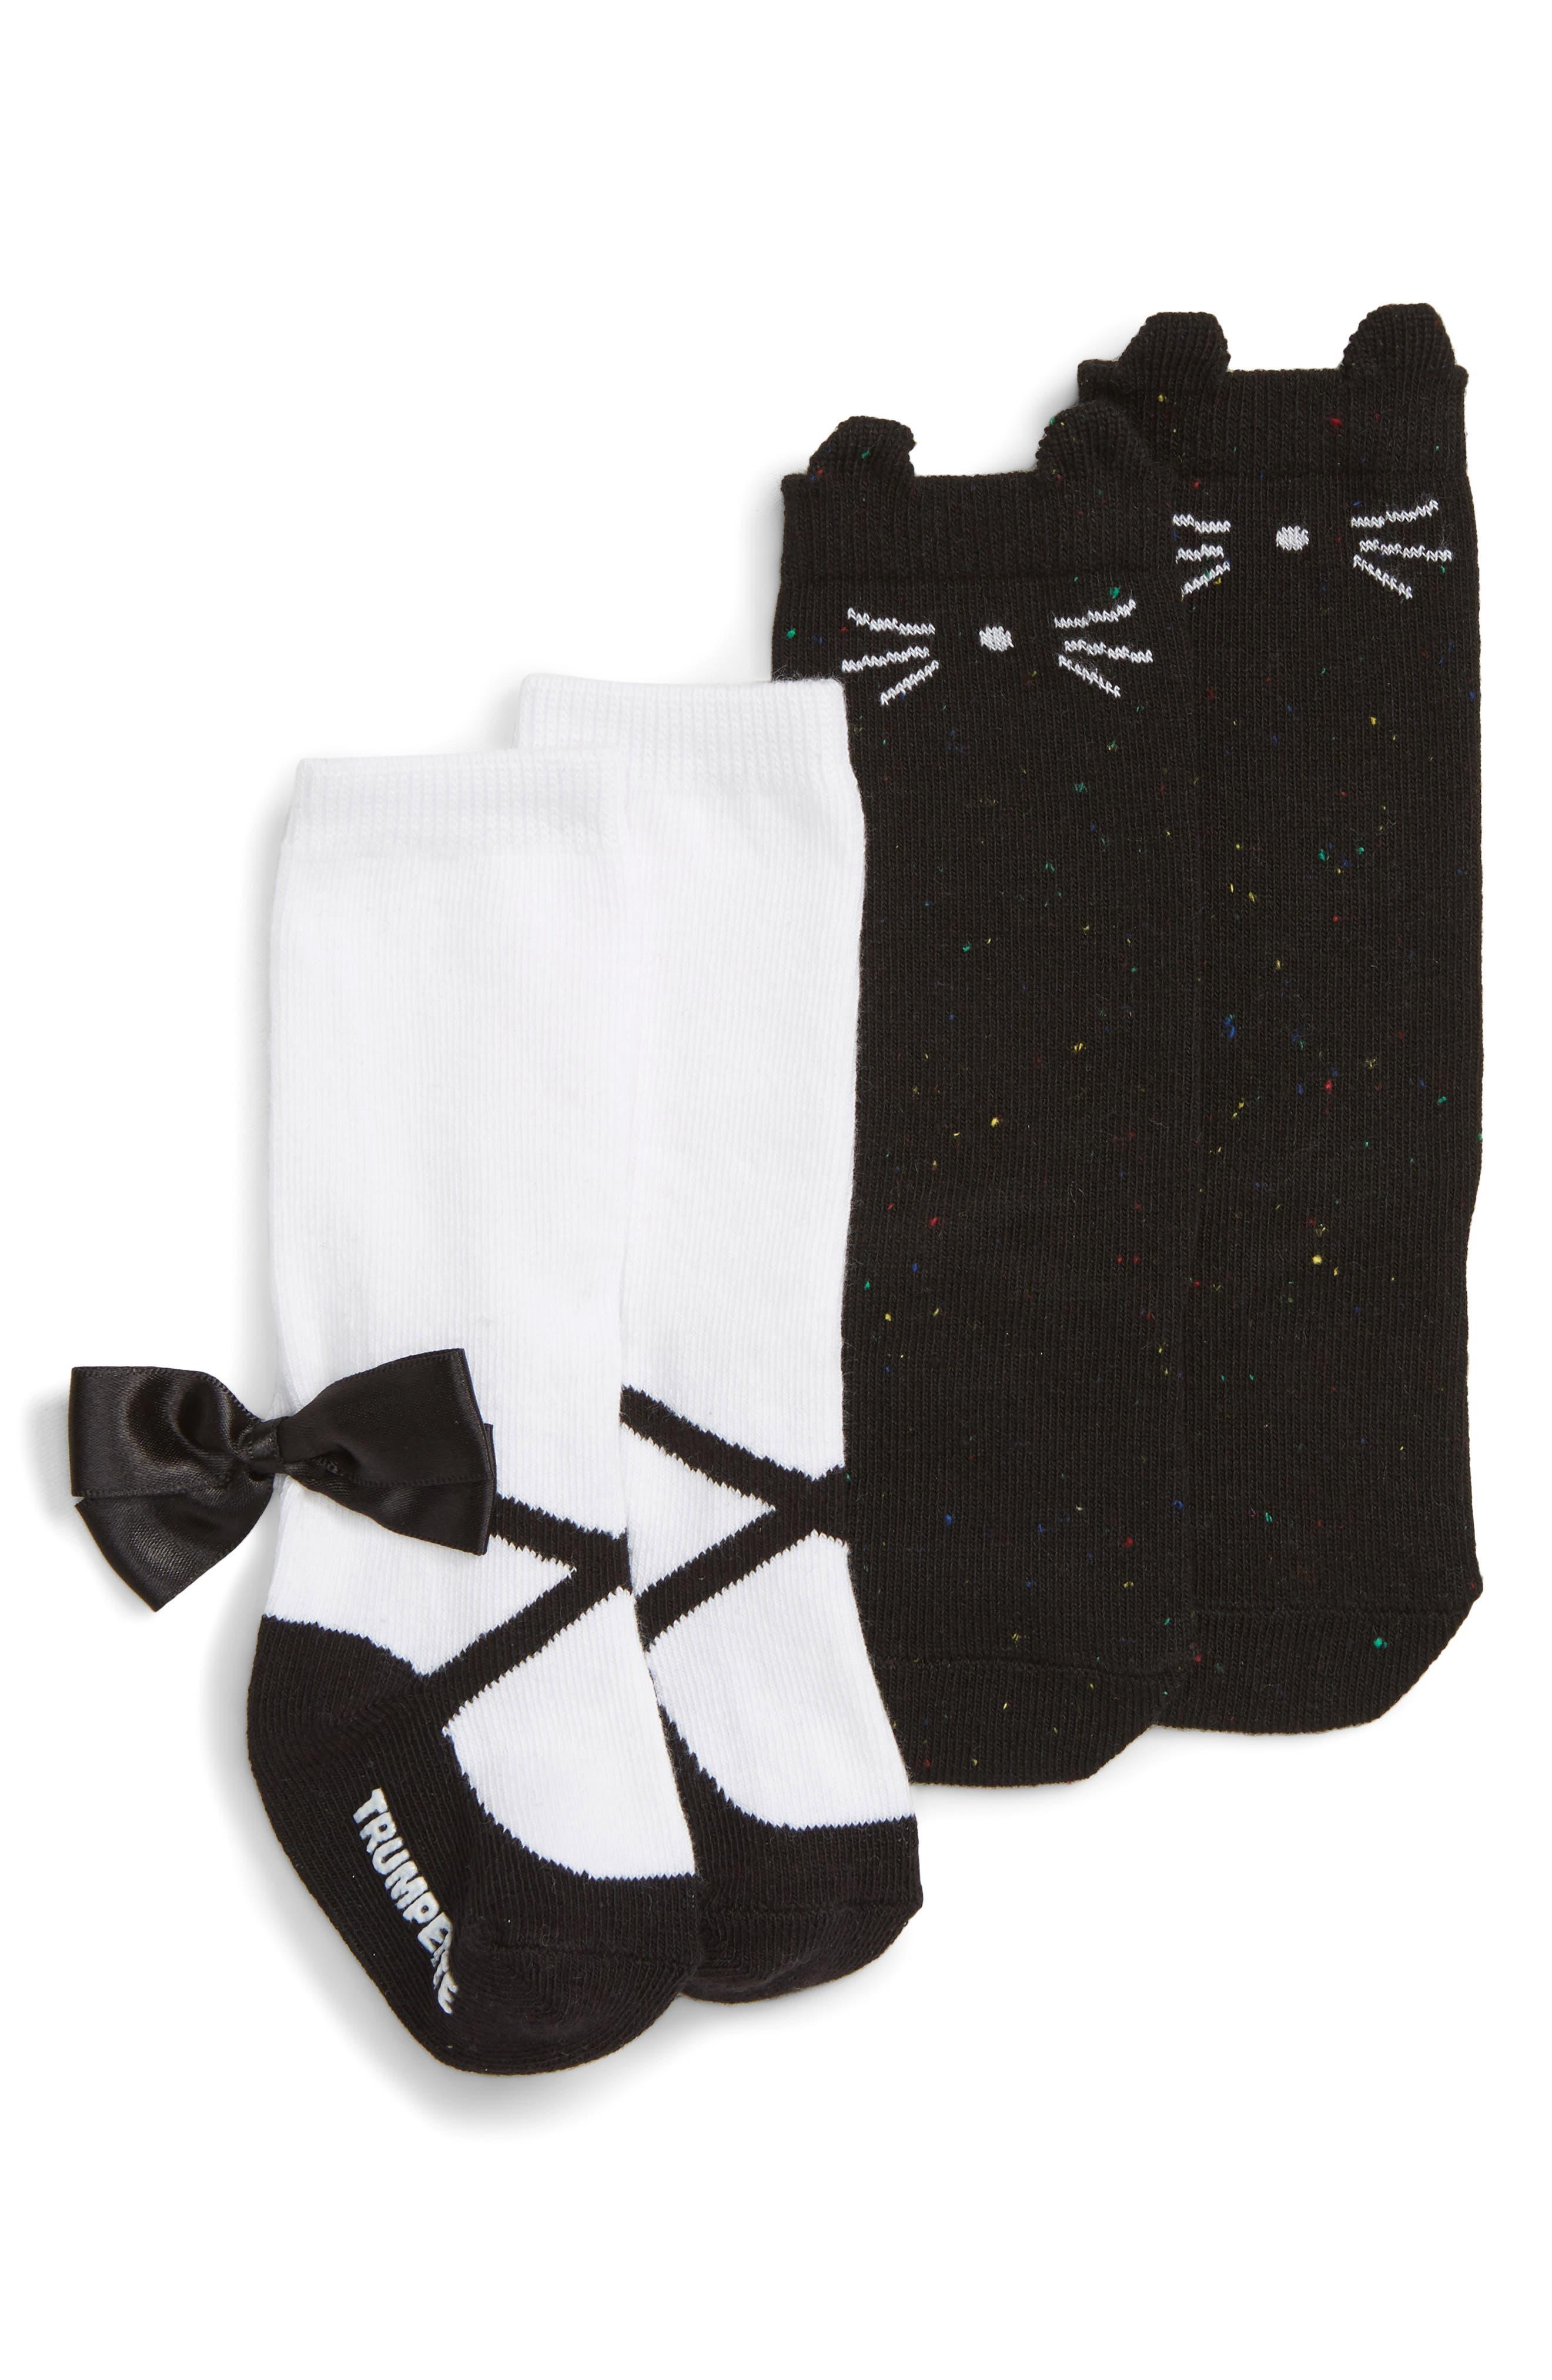 Nicole 2-Pack Socks,                             Main thumbnail 1, color,                             002